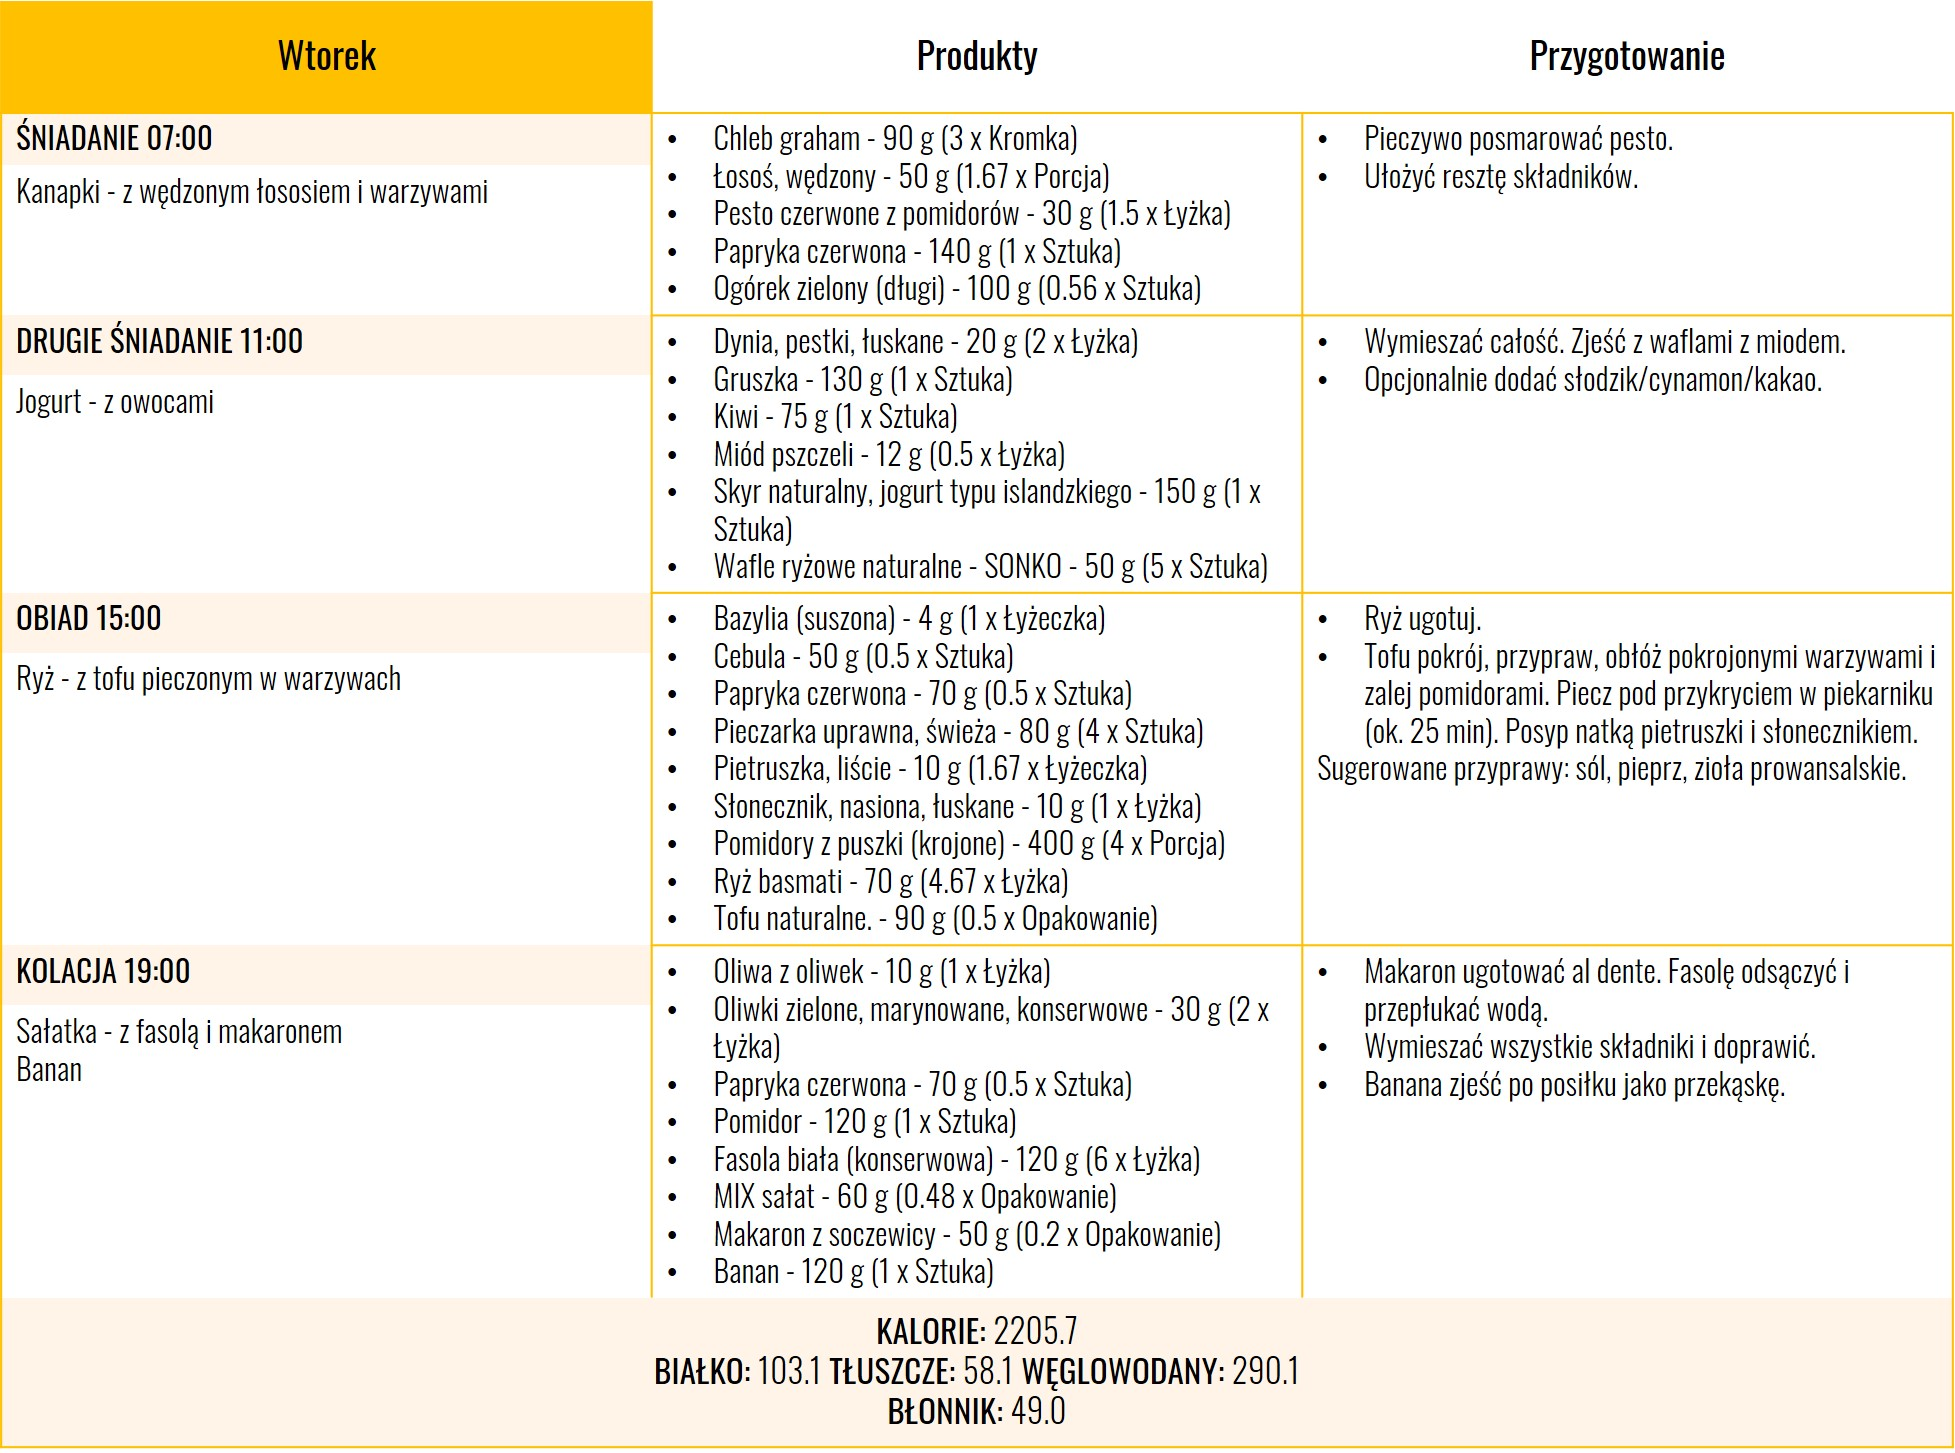 Dieta fleksitariańska 2200 kcal - dzien drugi